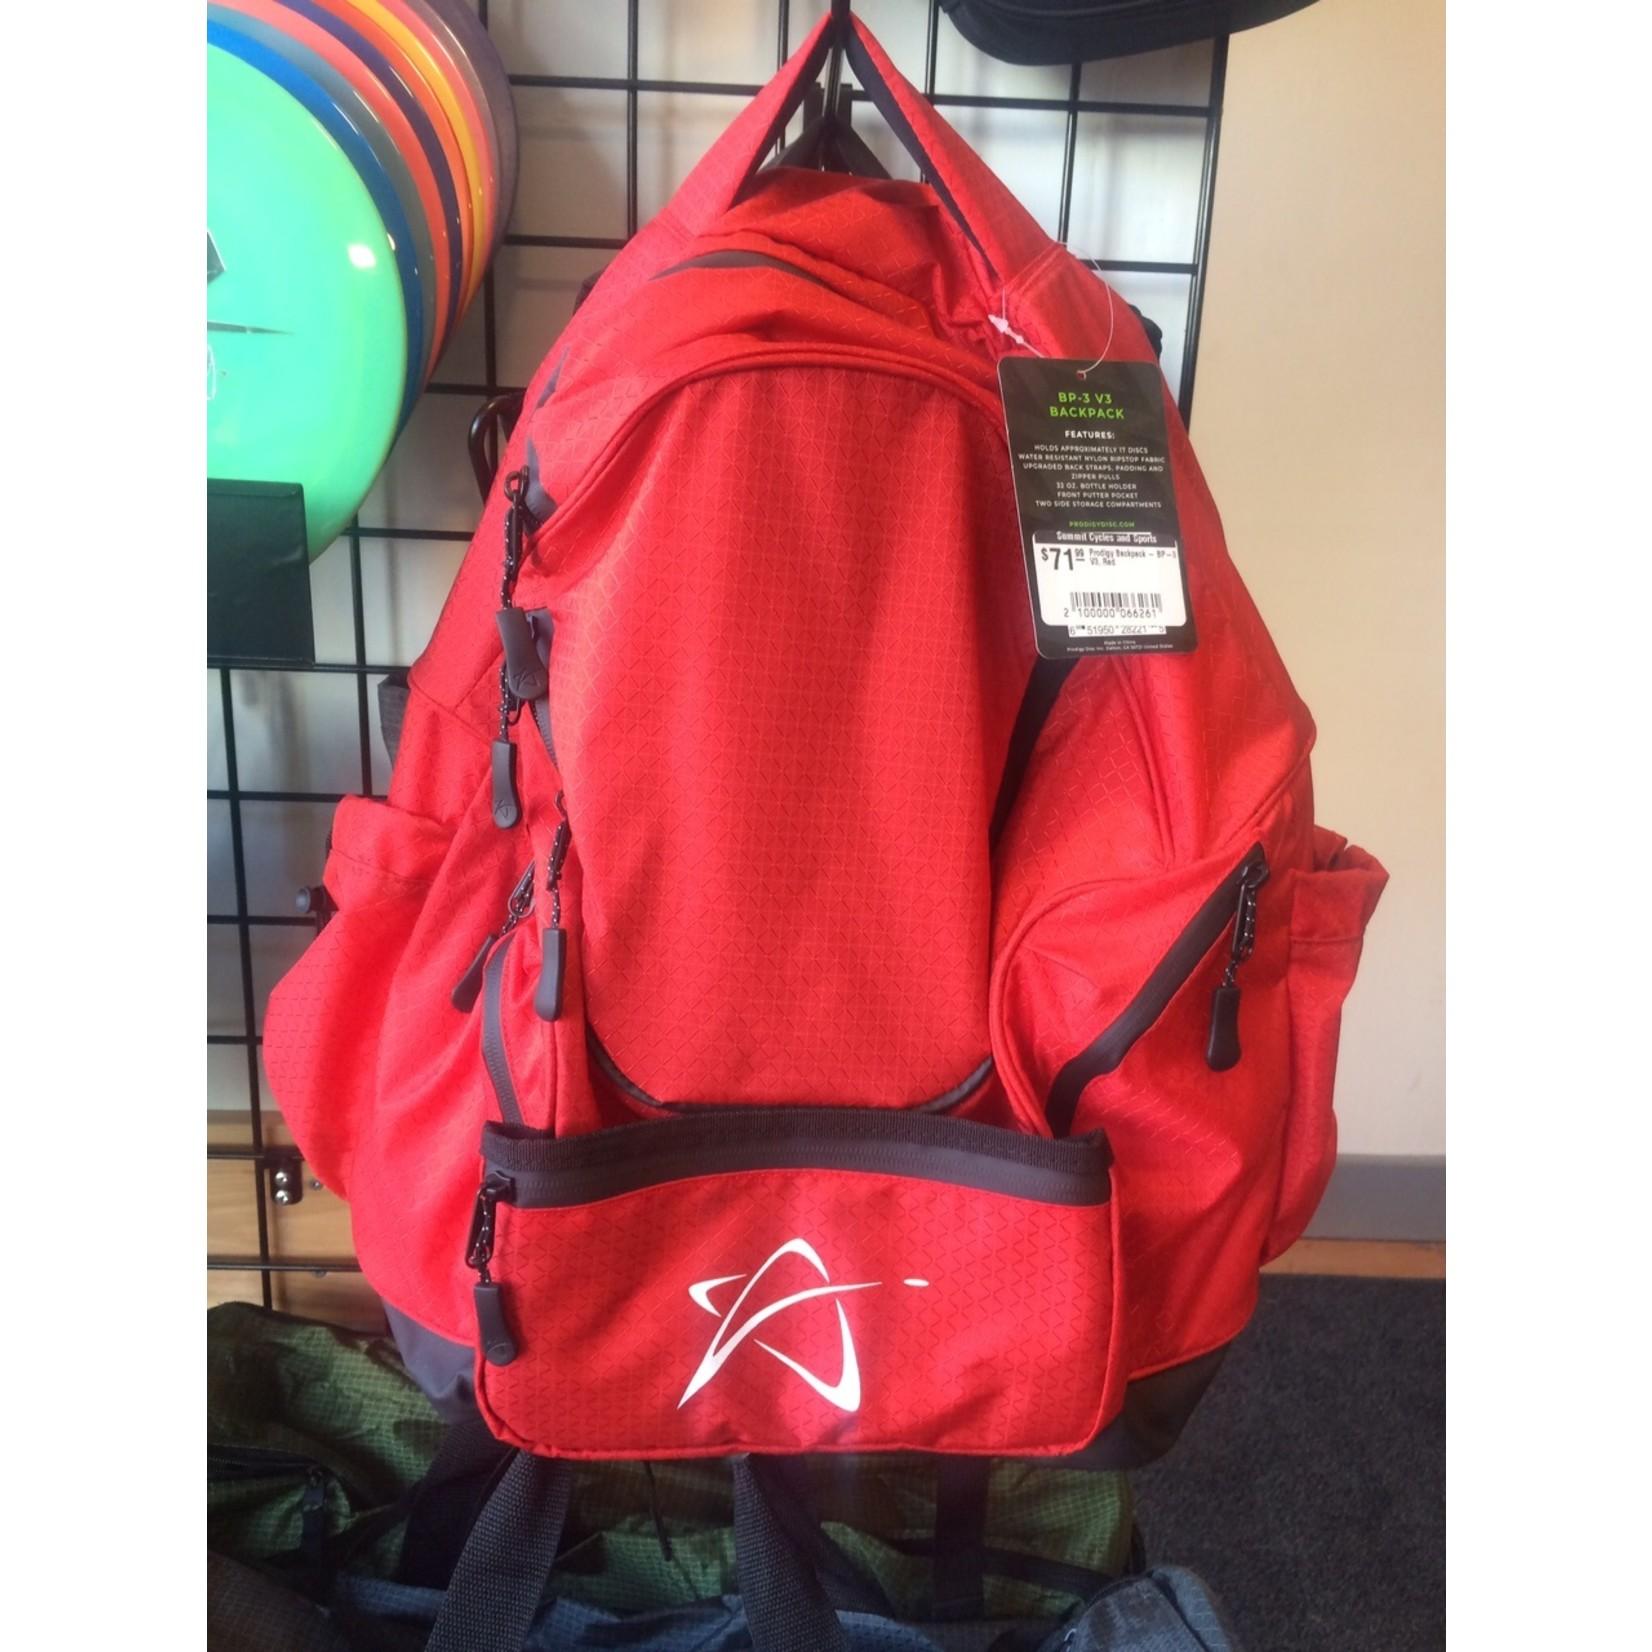 Prodigy Discs Prodigy Backpack - BP-3 V3, Red